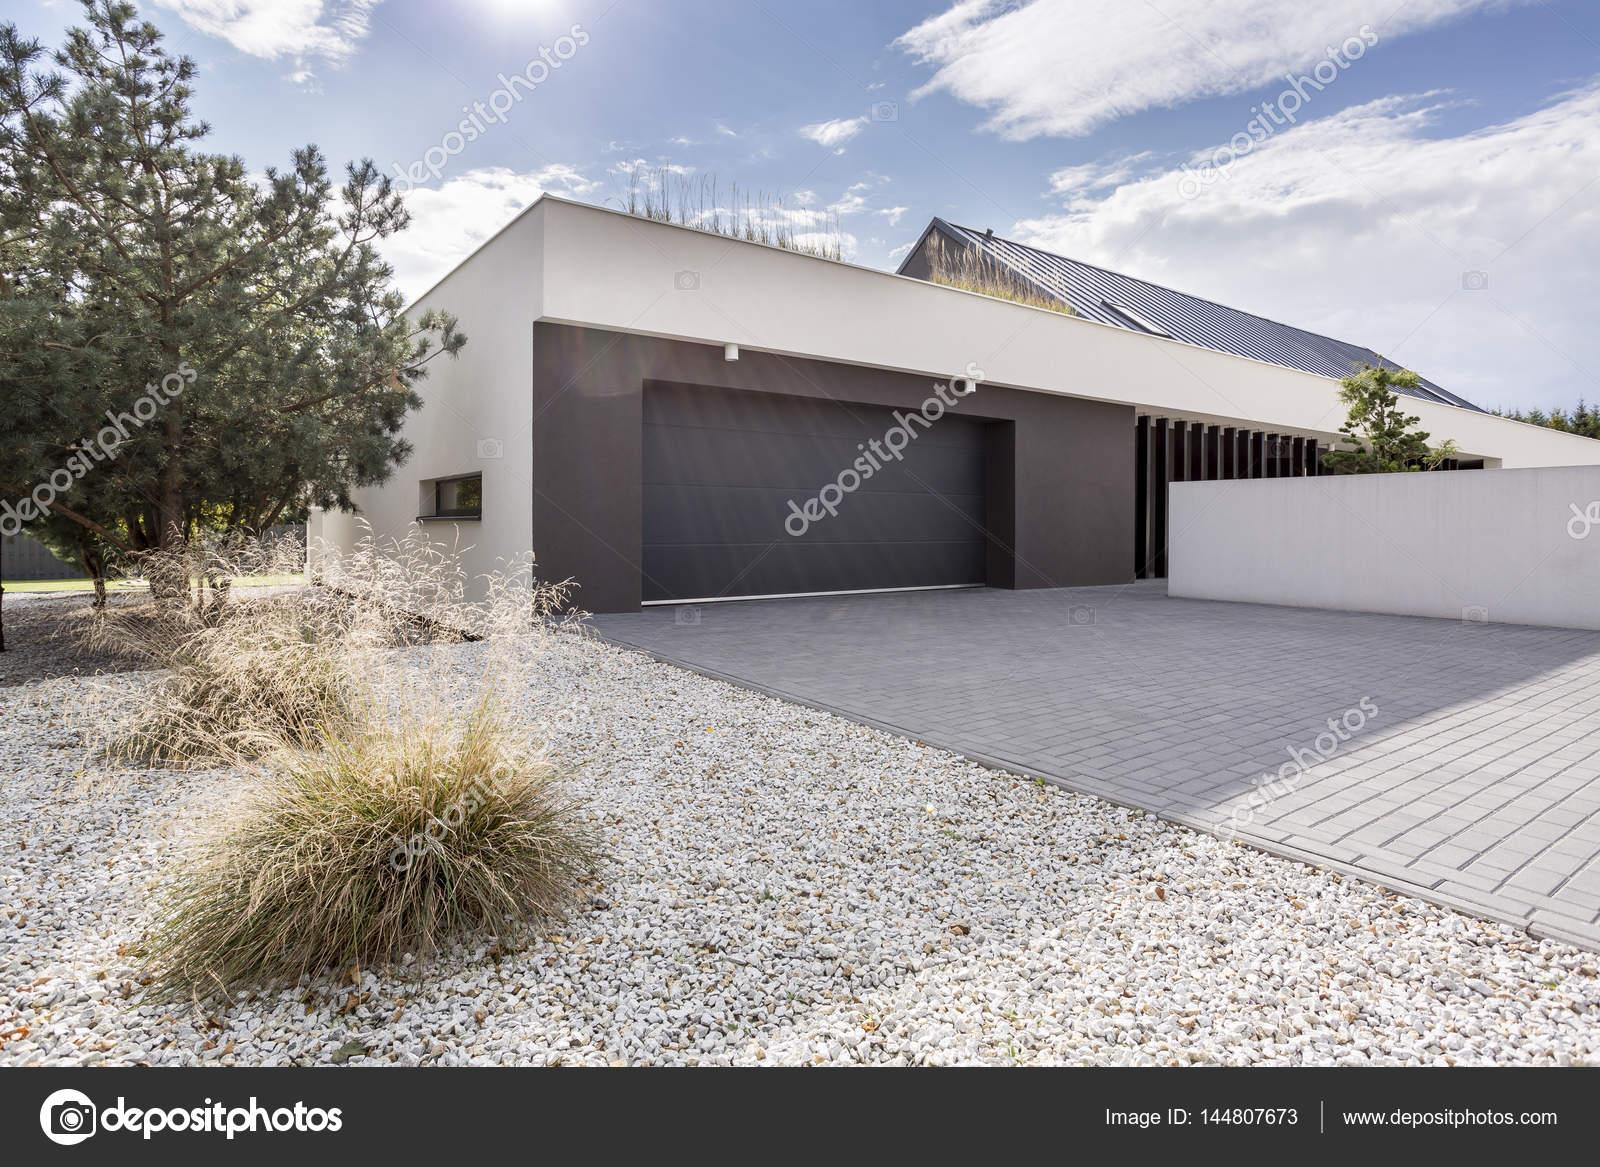 Haus mit doppelgarage  Haus mit Doppelgarage — Stockfoto © photographee.eu #144807673